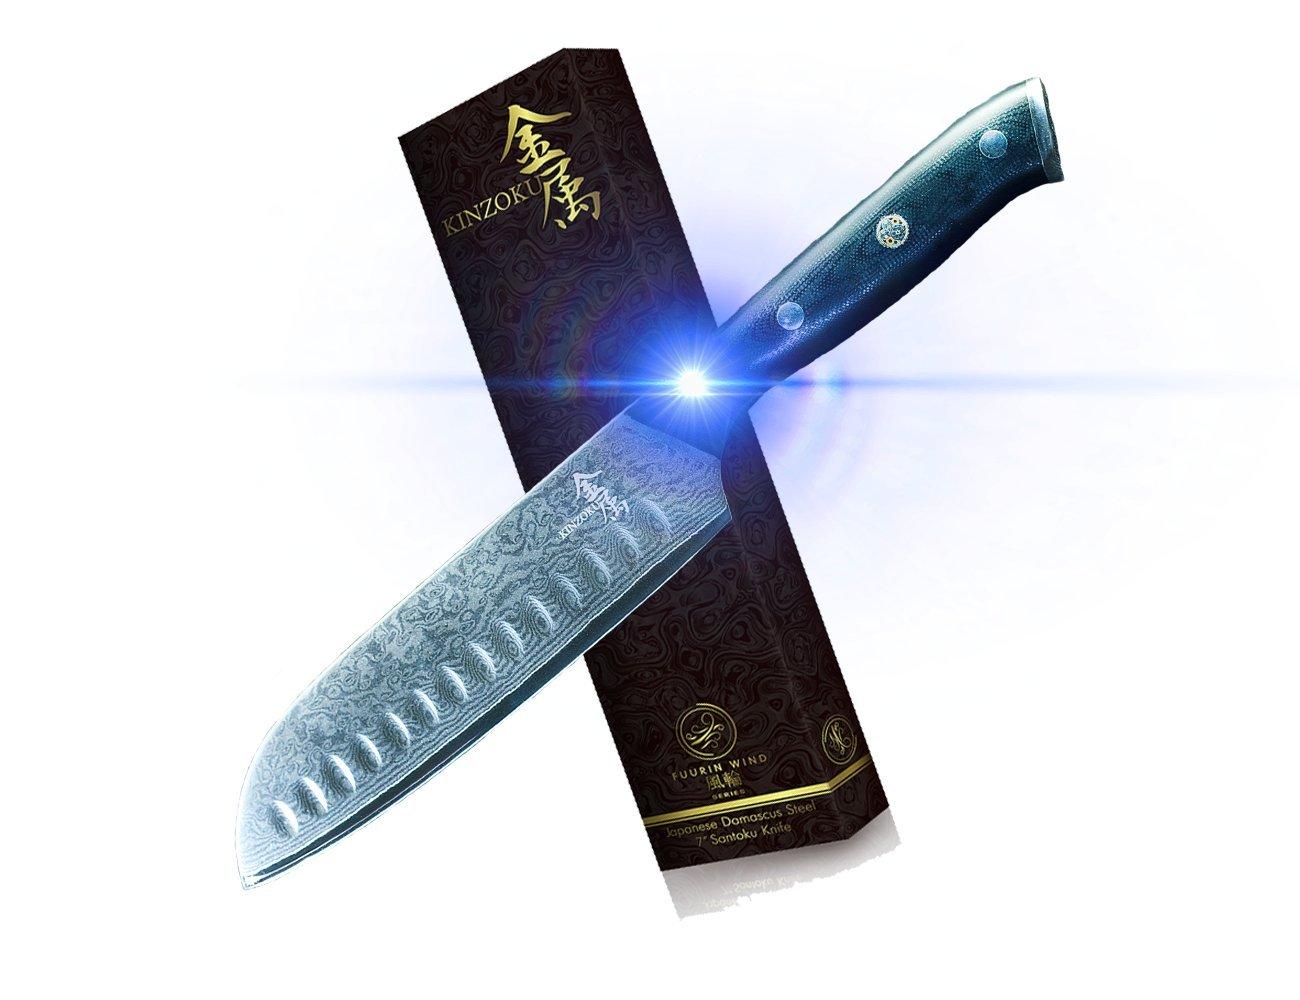 Kinzoku Japanese Damascus Steel Fuurin Wind Series 7'' Santoku Knife 67 Layers VG10 Steel Core